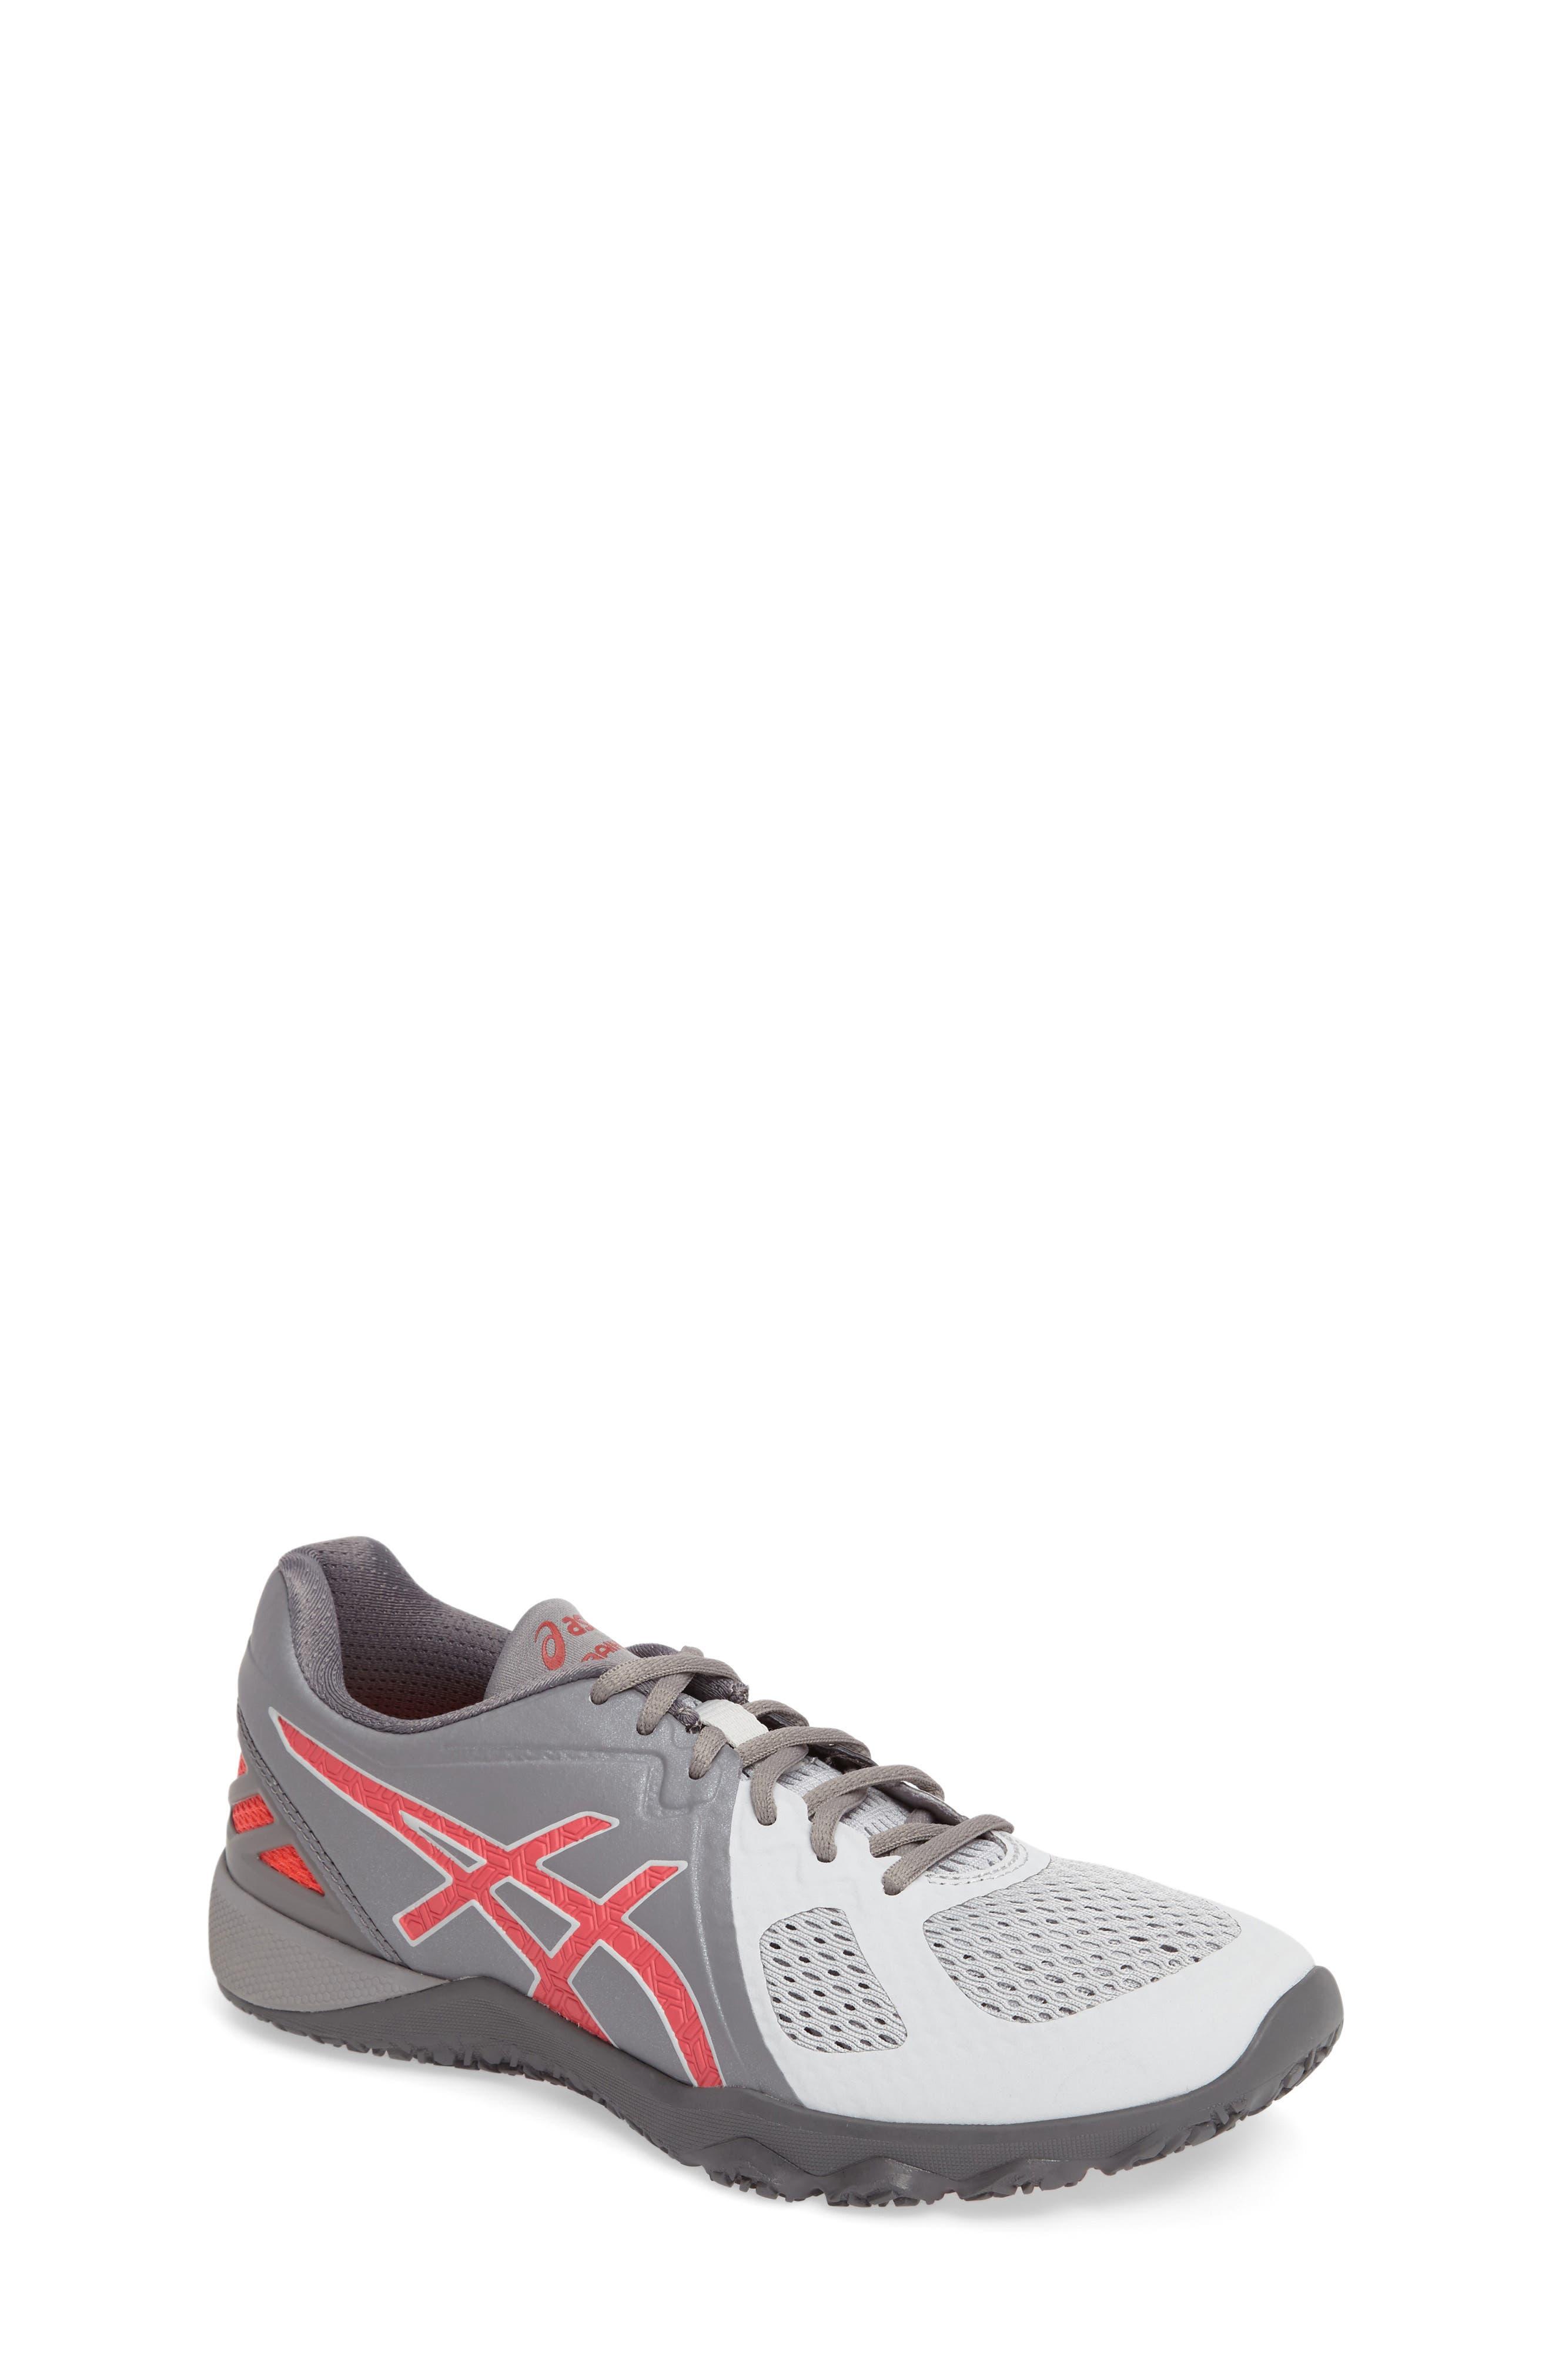 ASICS Conviction X Training Shoe, Main, color, 096